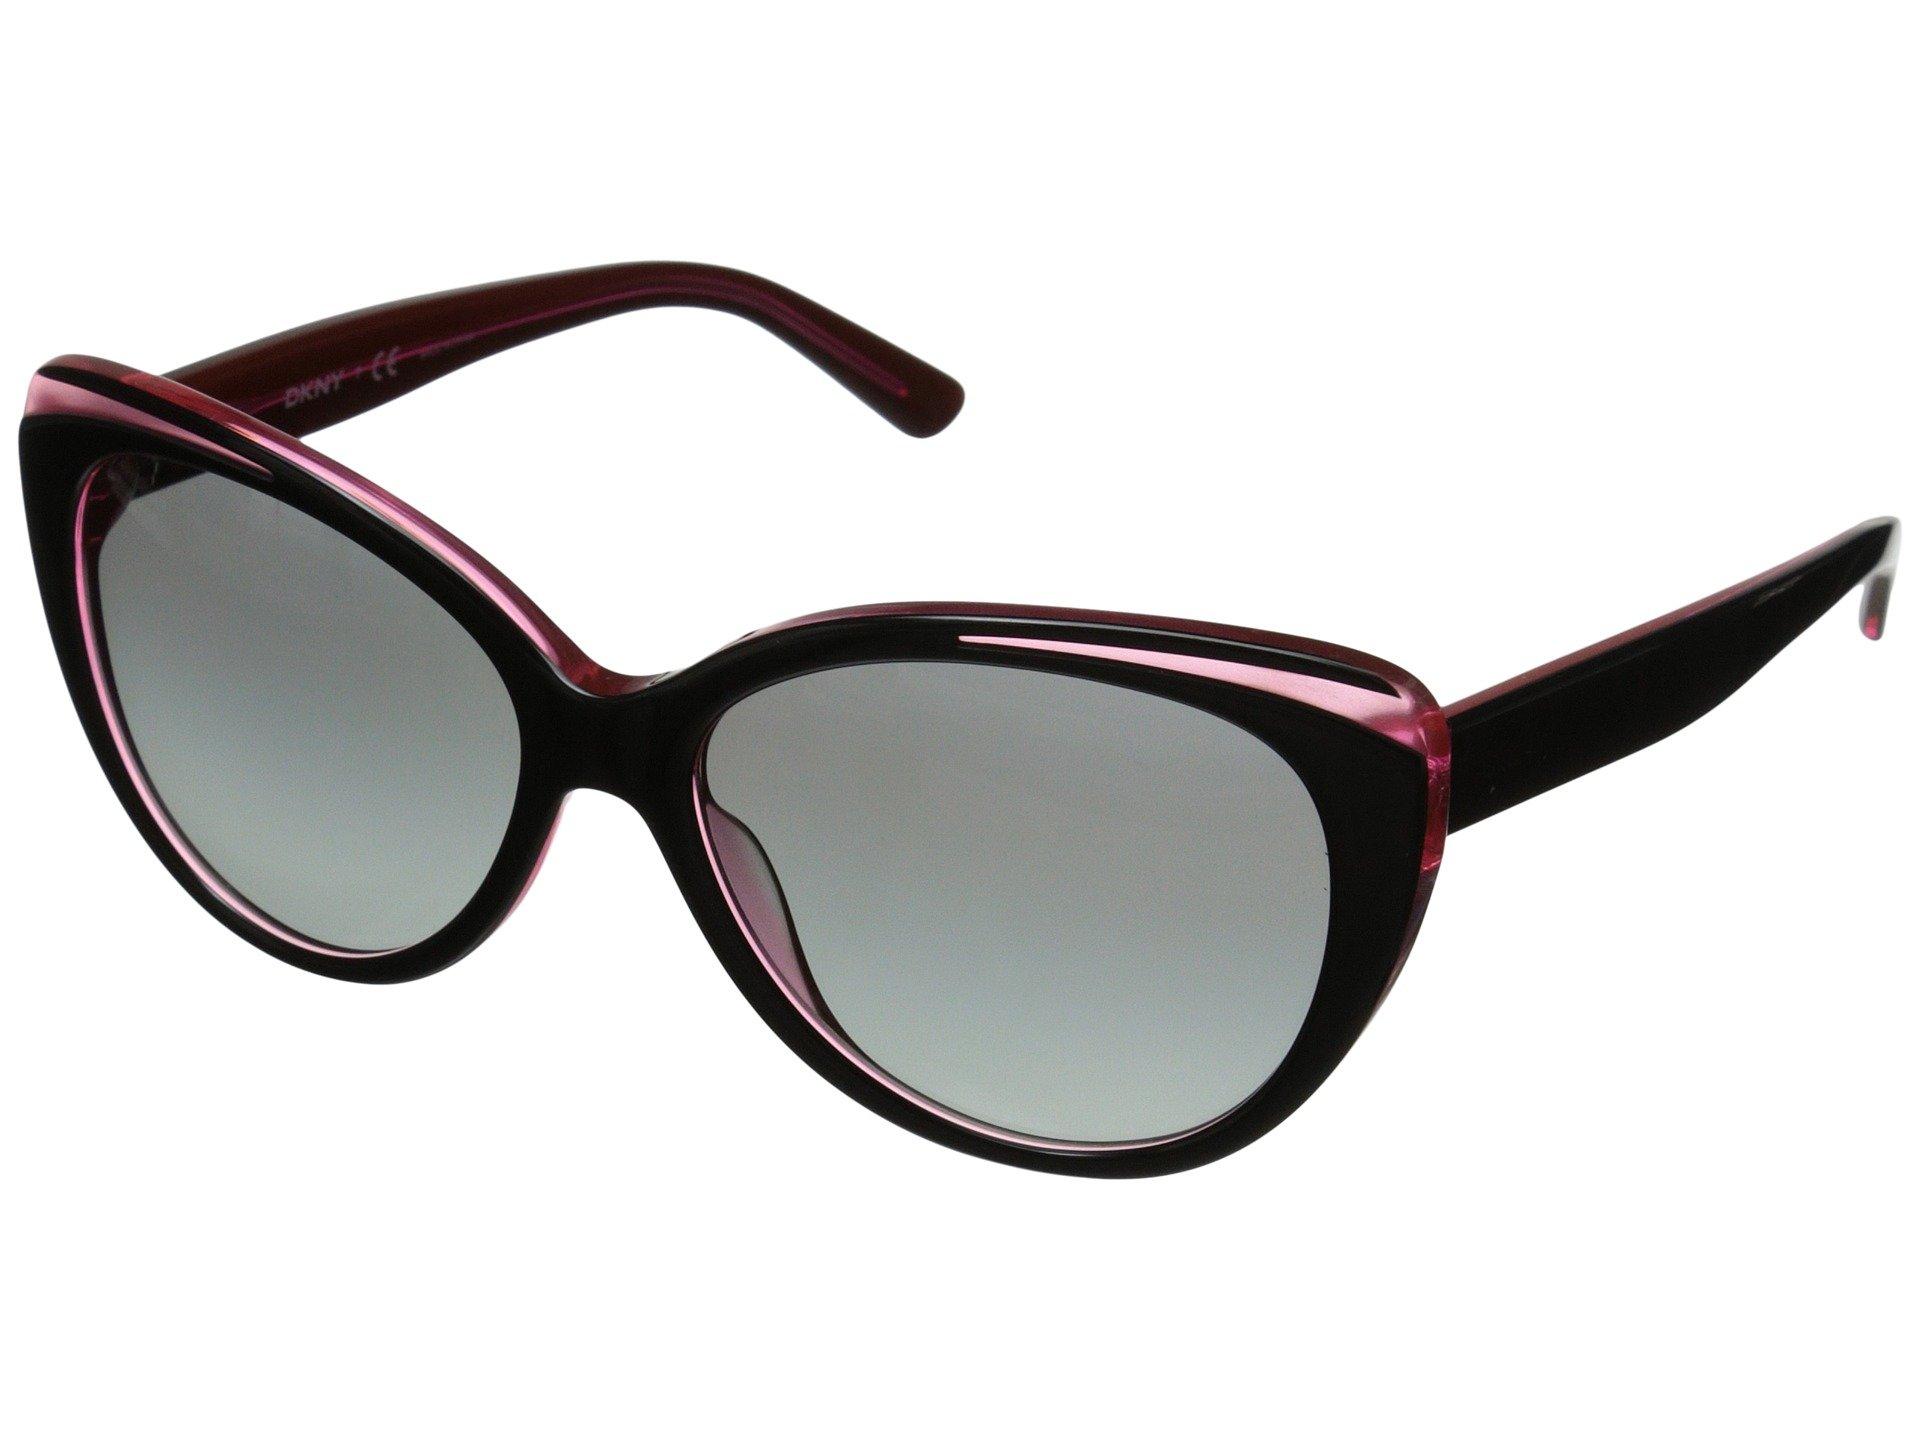 Gafas para Mujer DKNY 0DY4125  + DKNY en VeoyCompro.net